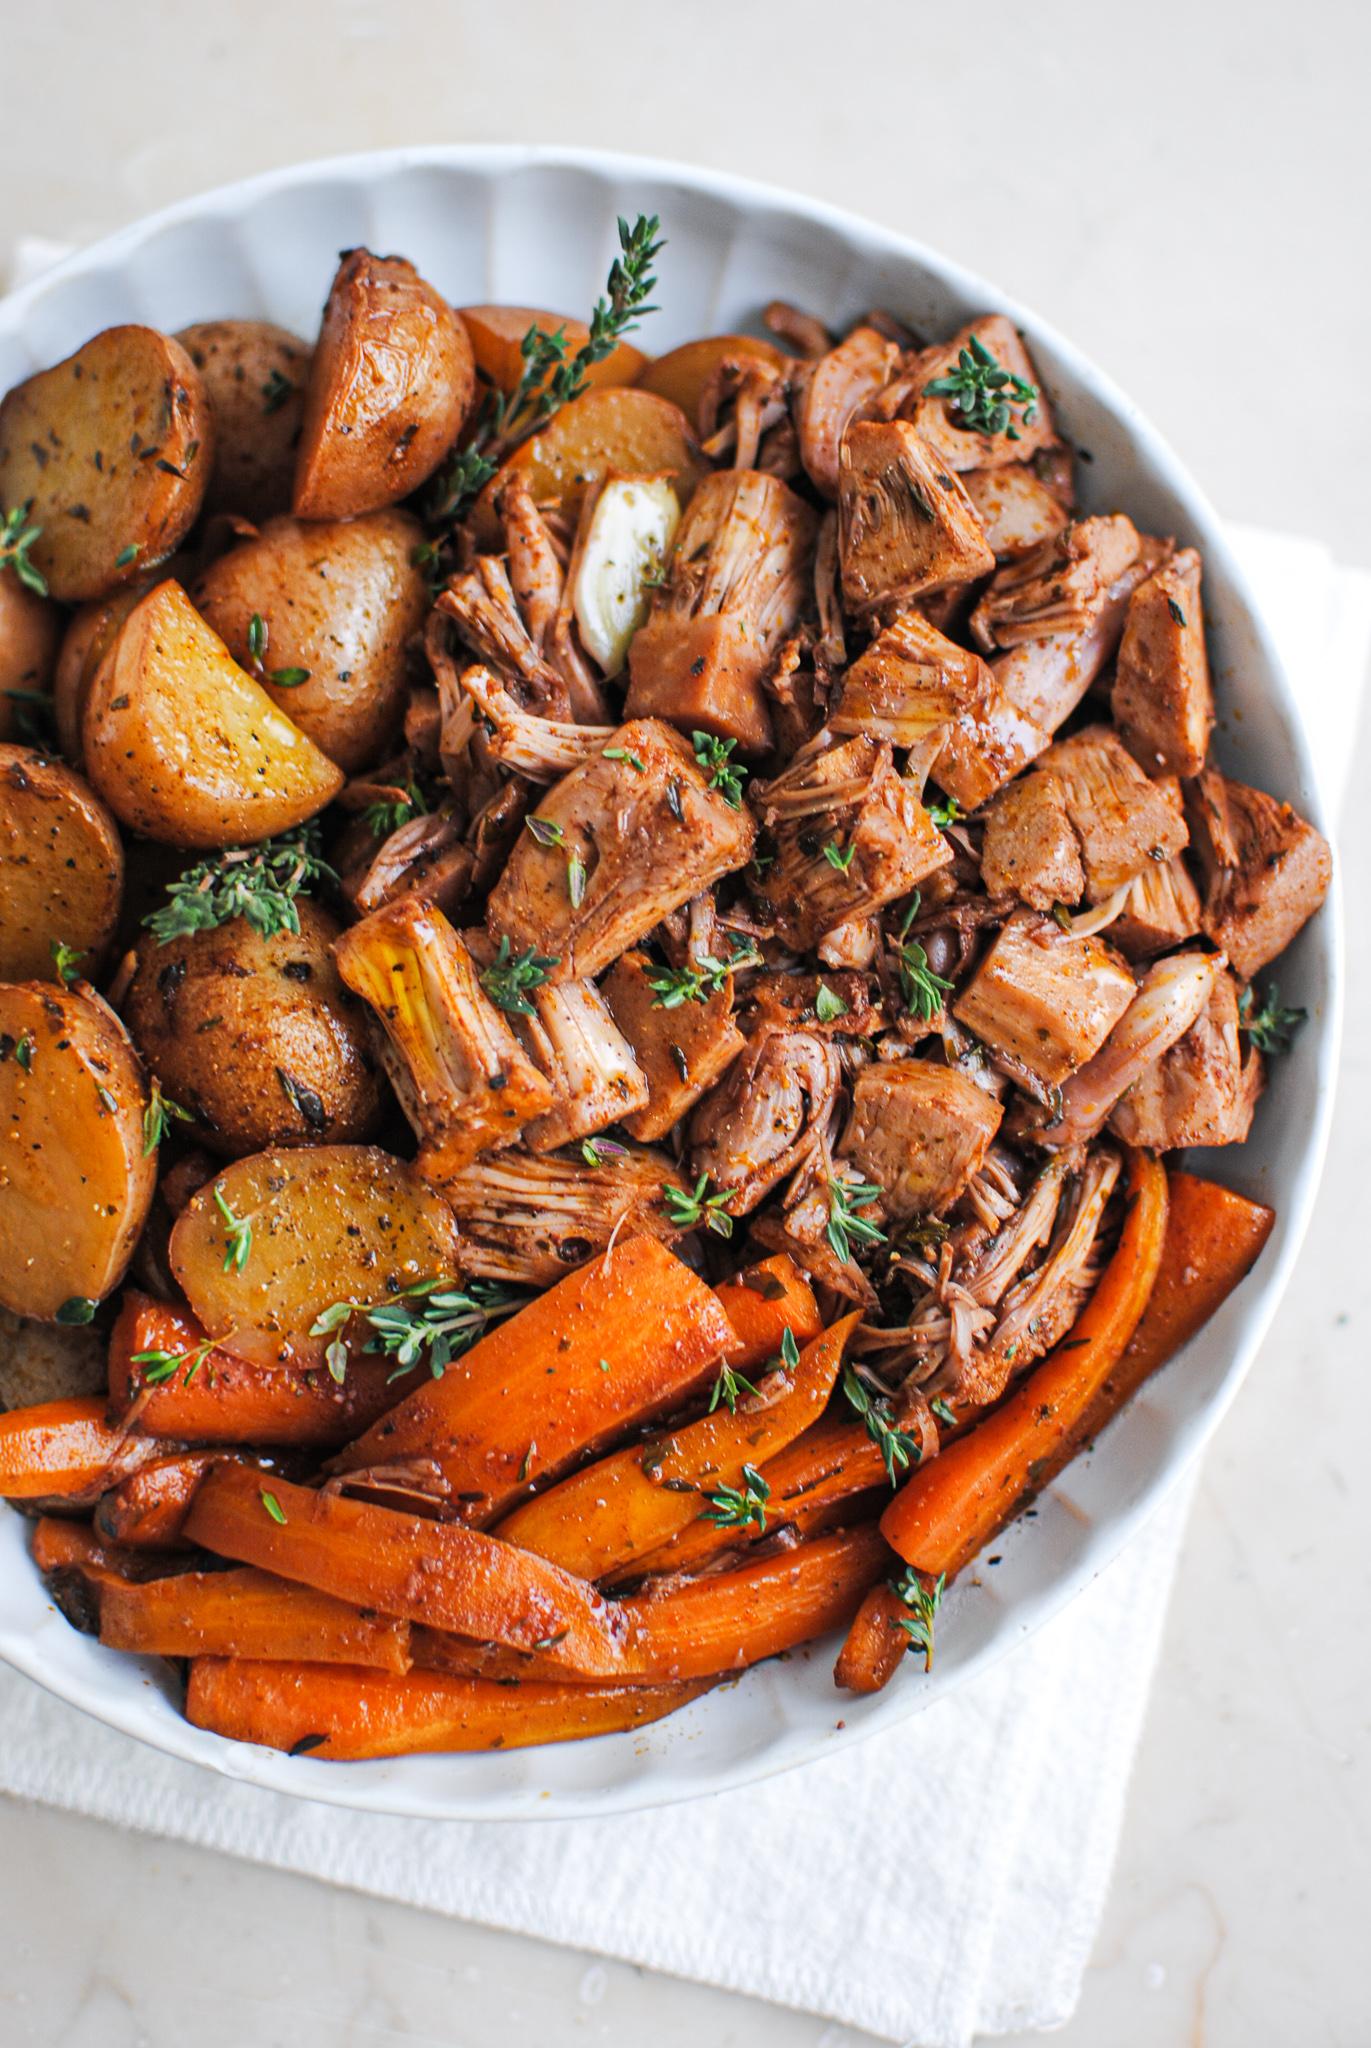 assado vegan de domingo | please consider | joana limao